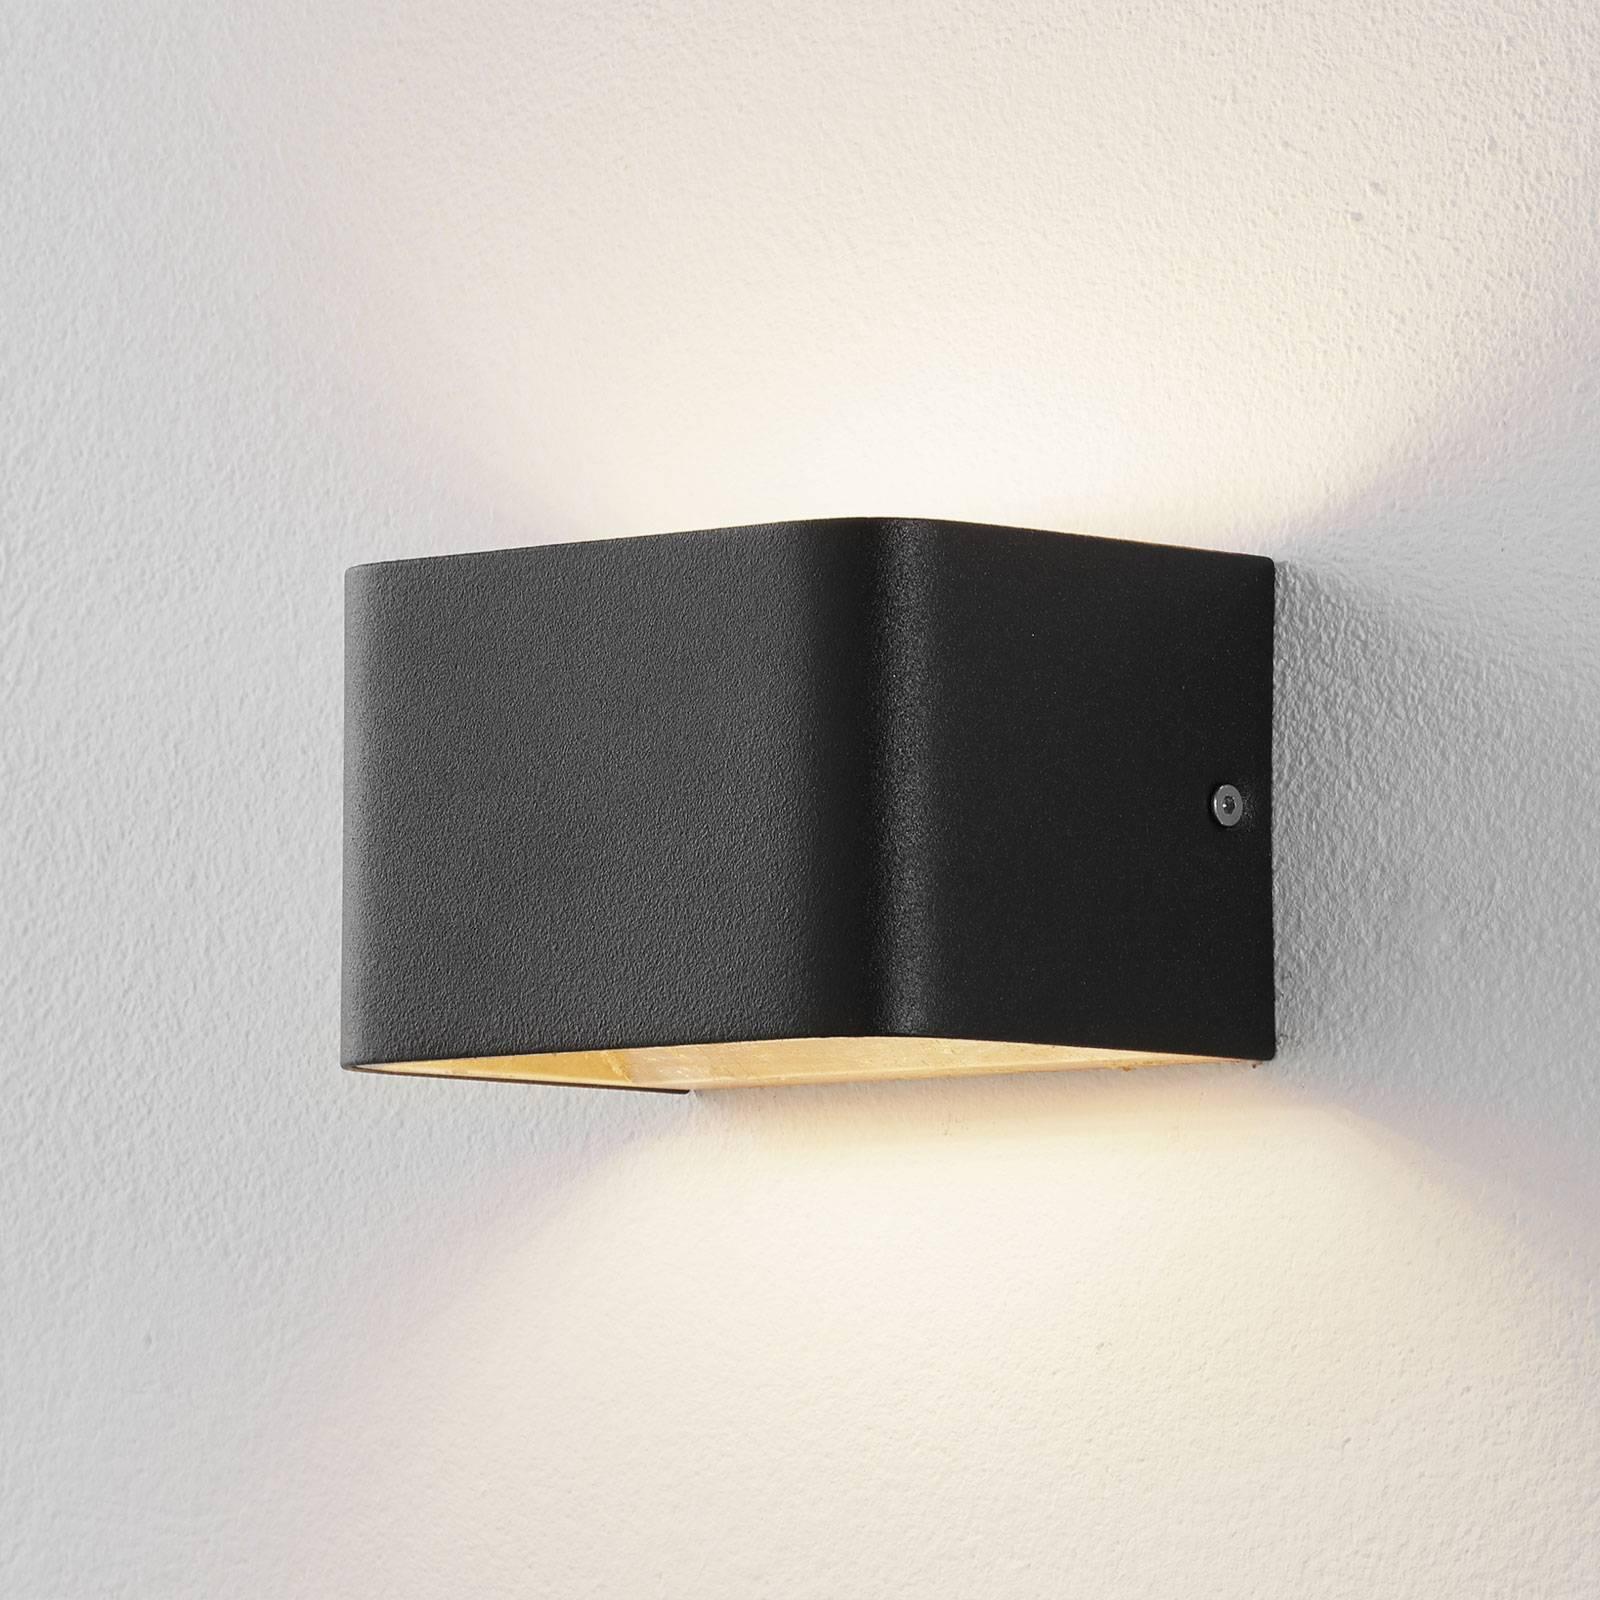 Lucande Sessa -LED-seinävalaisin 13 cm musta/kulta